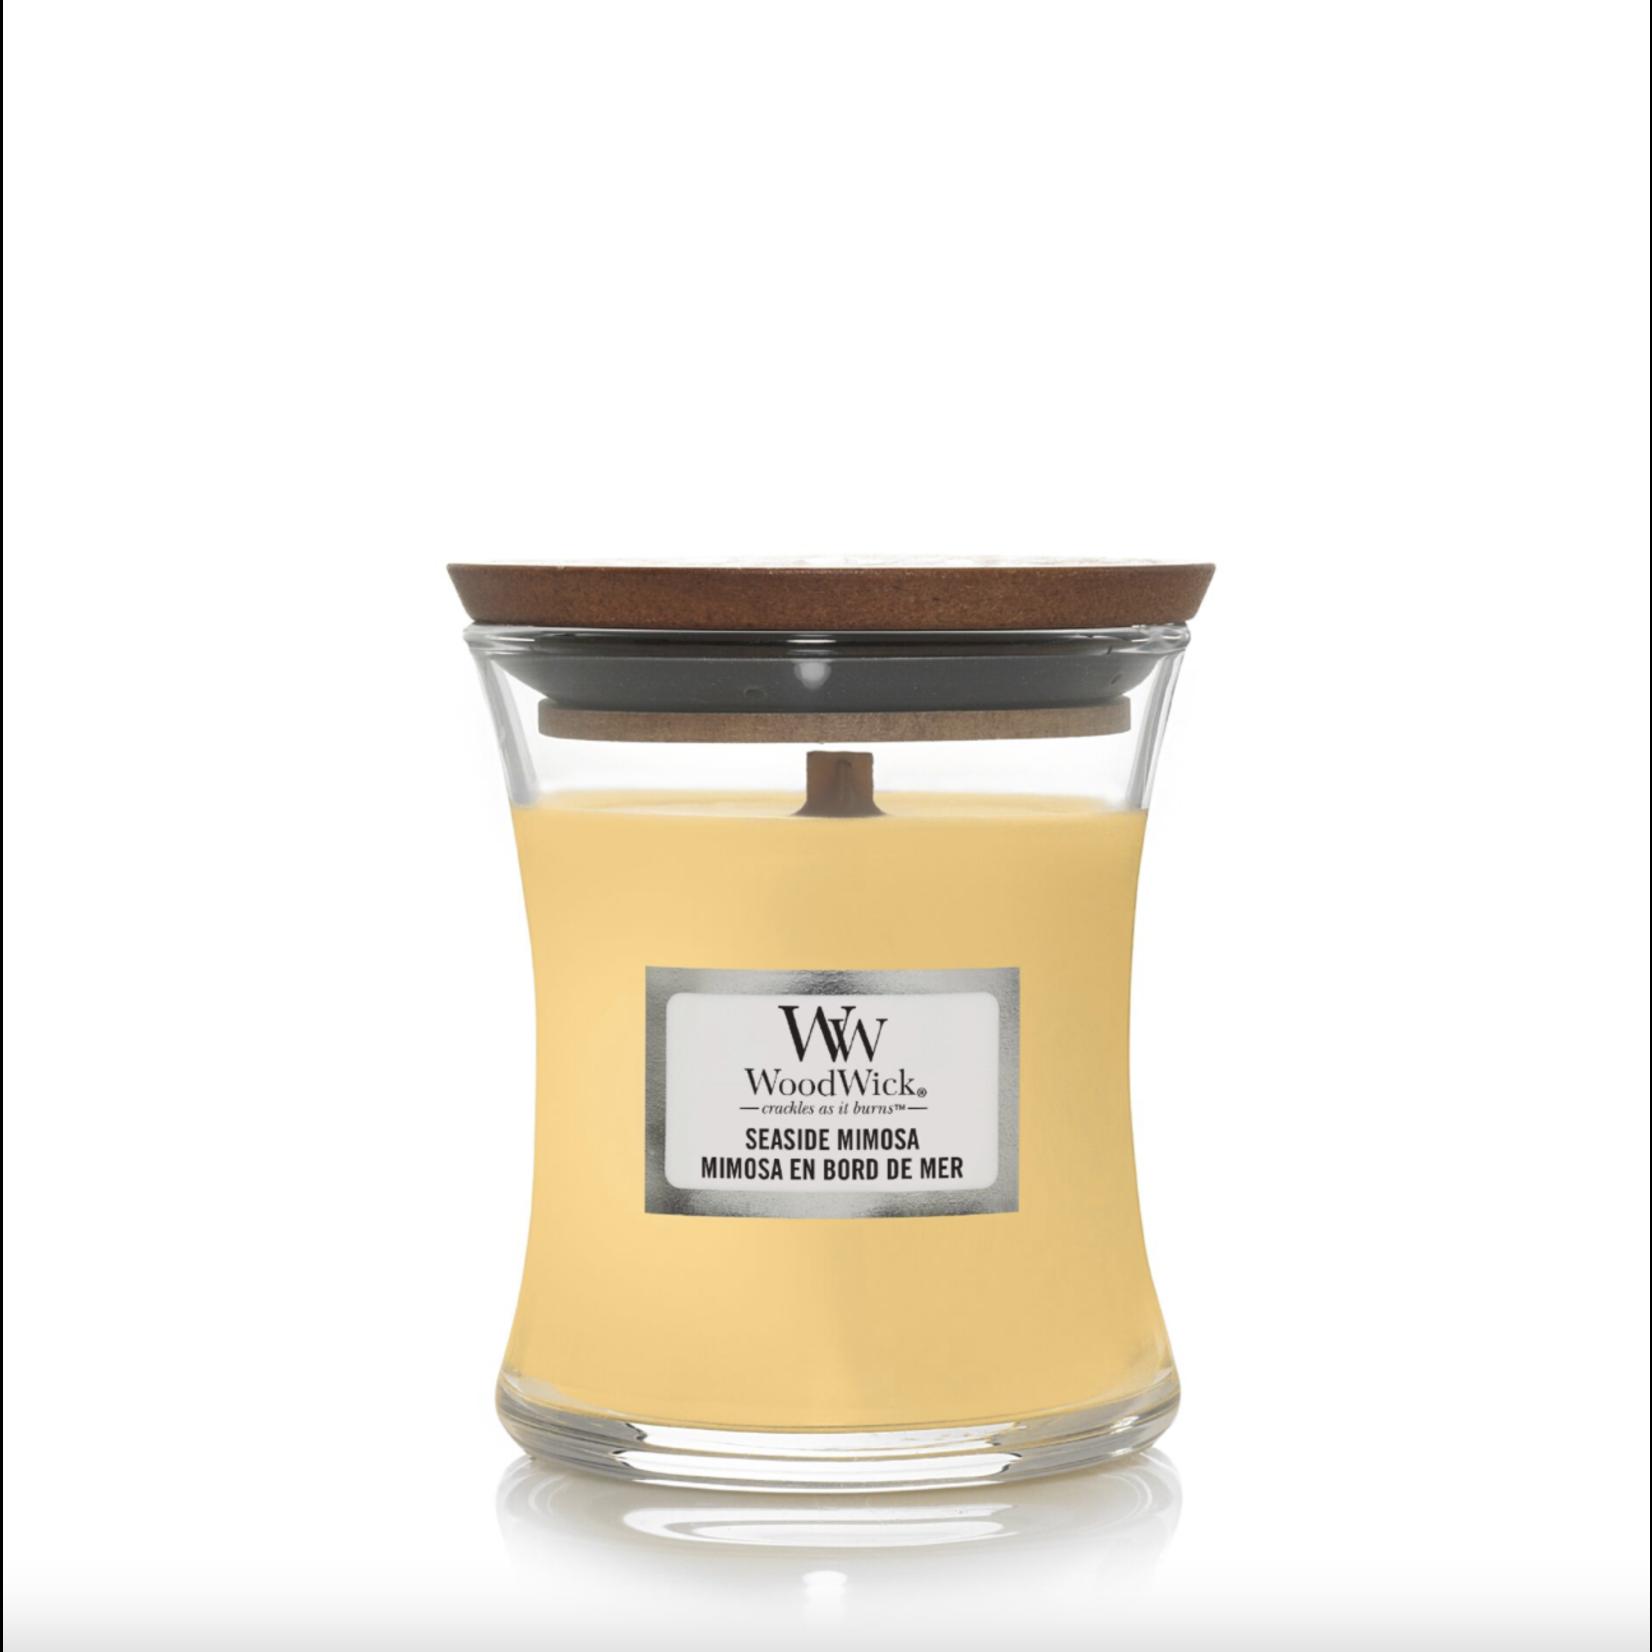 WoodWick WW Seaside Mimosa Mini Candle 20 branduren